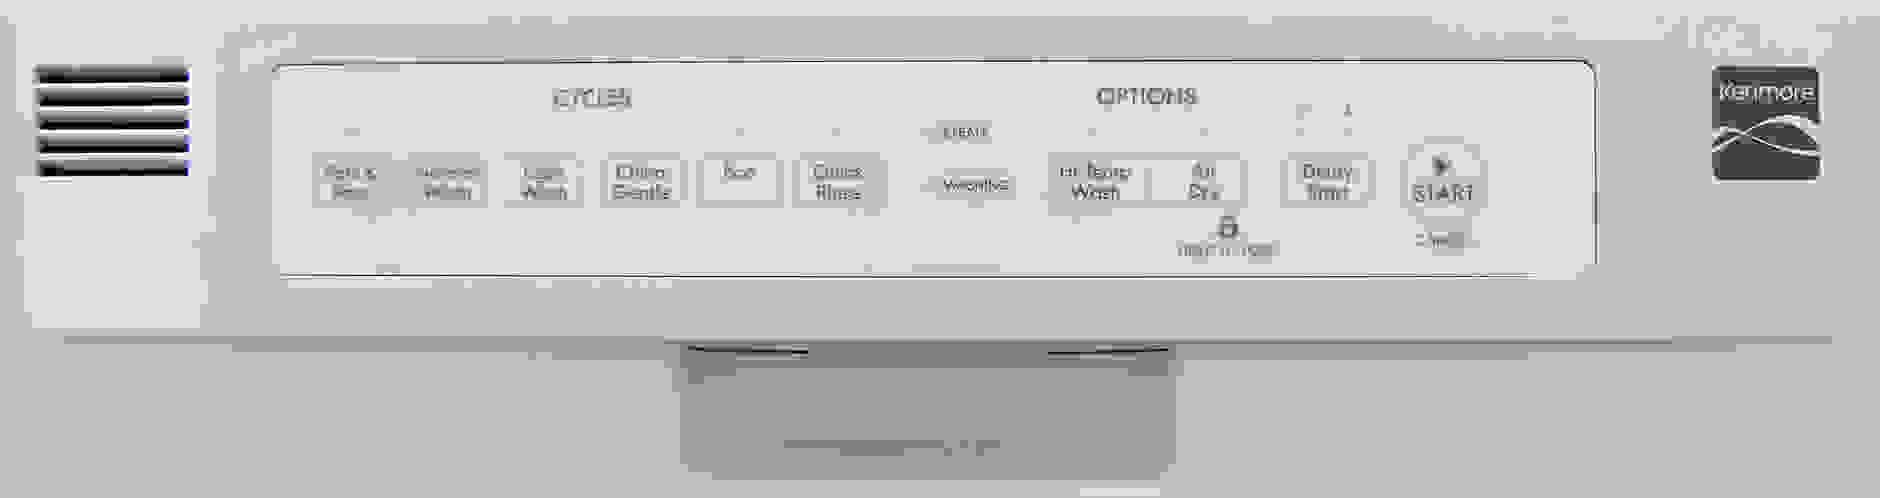 Kenmore 14652 controls